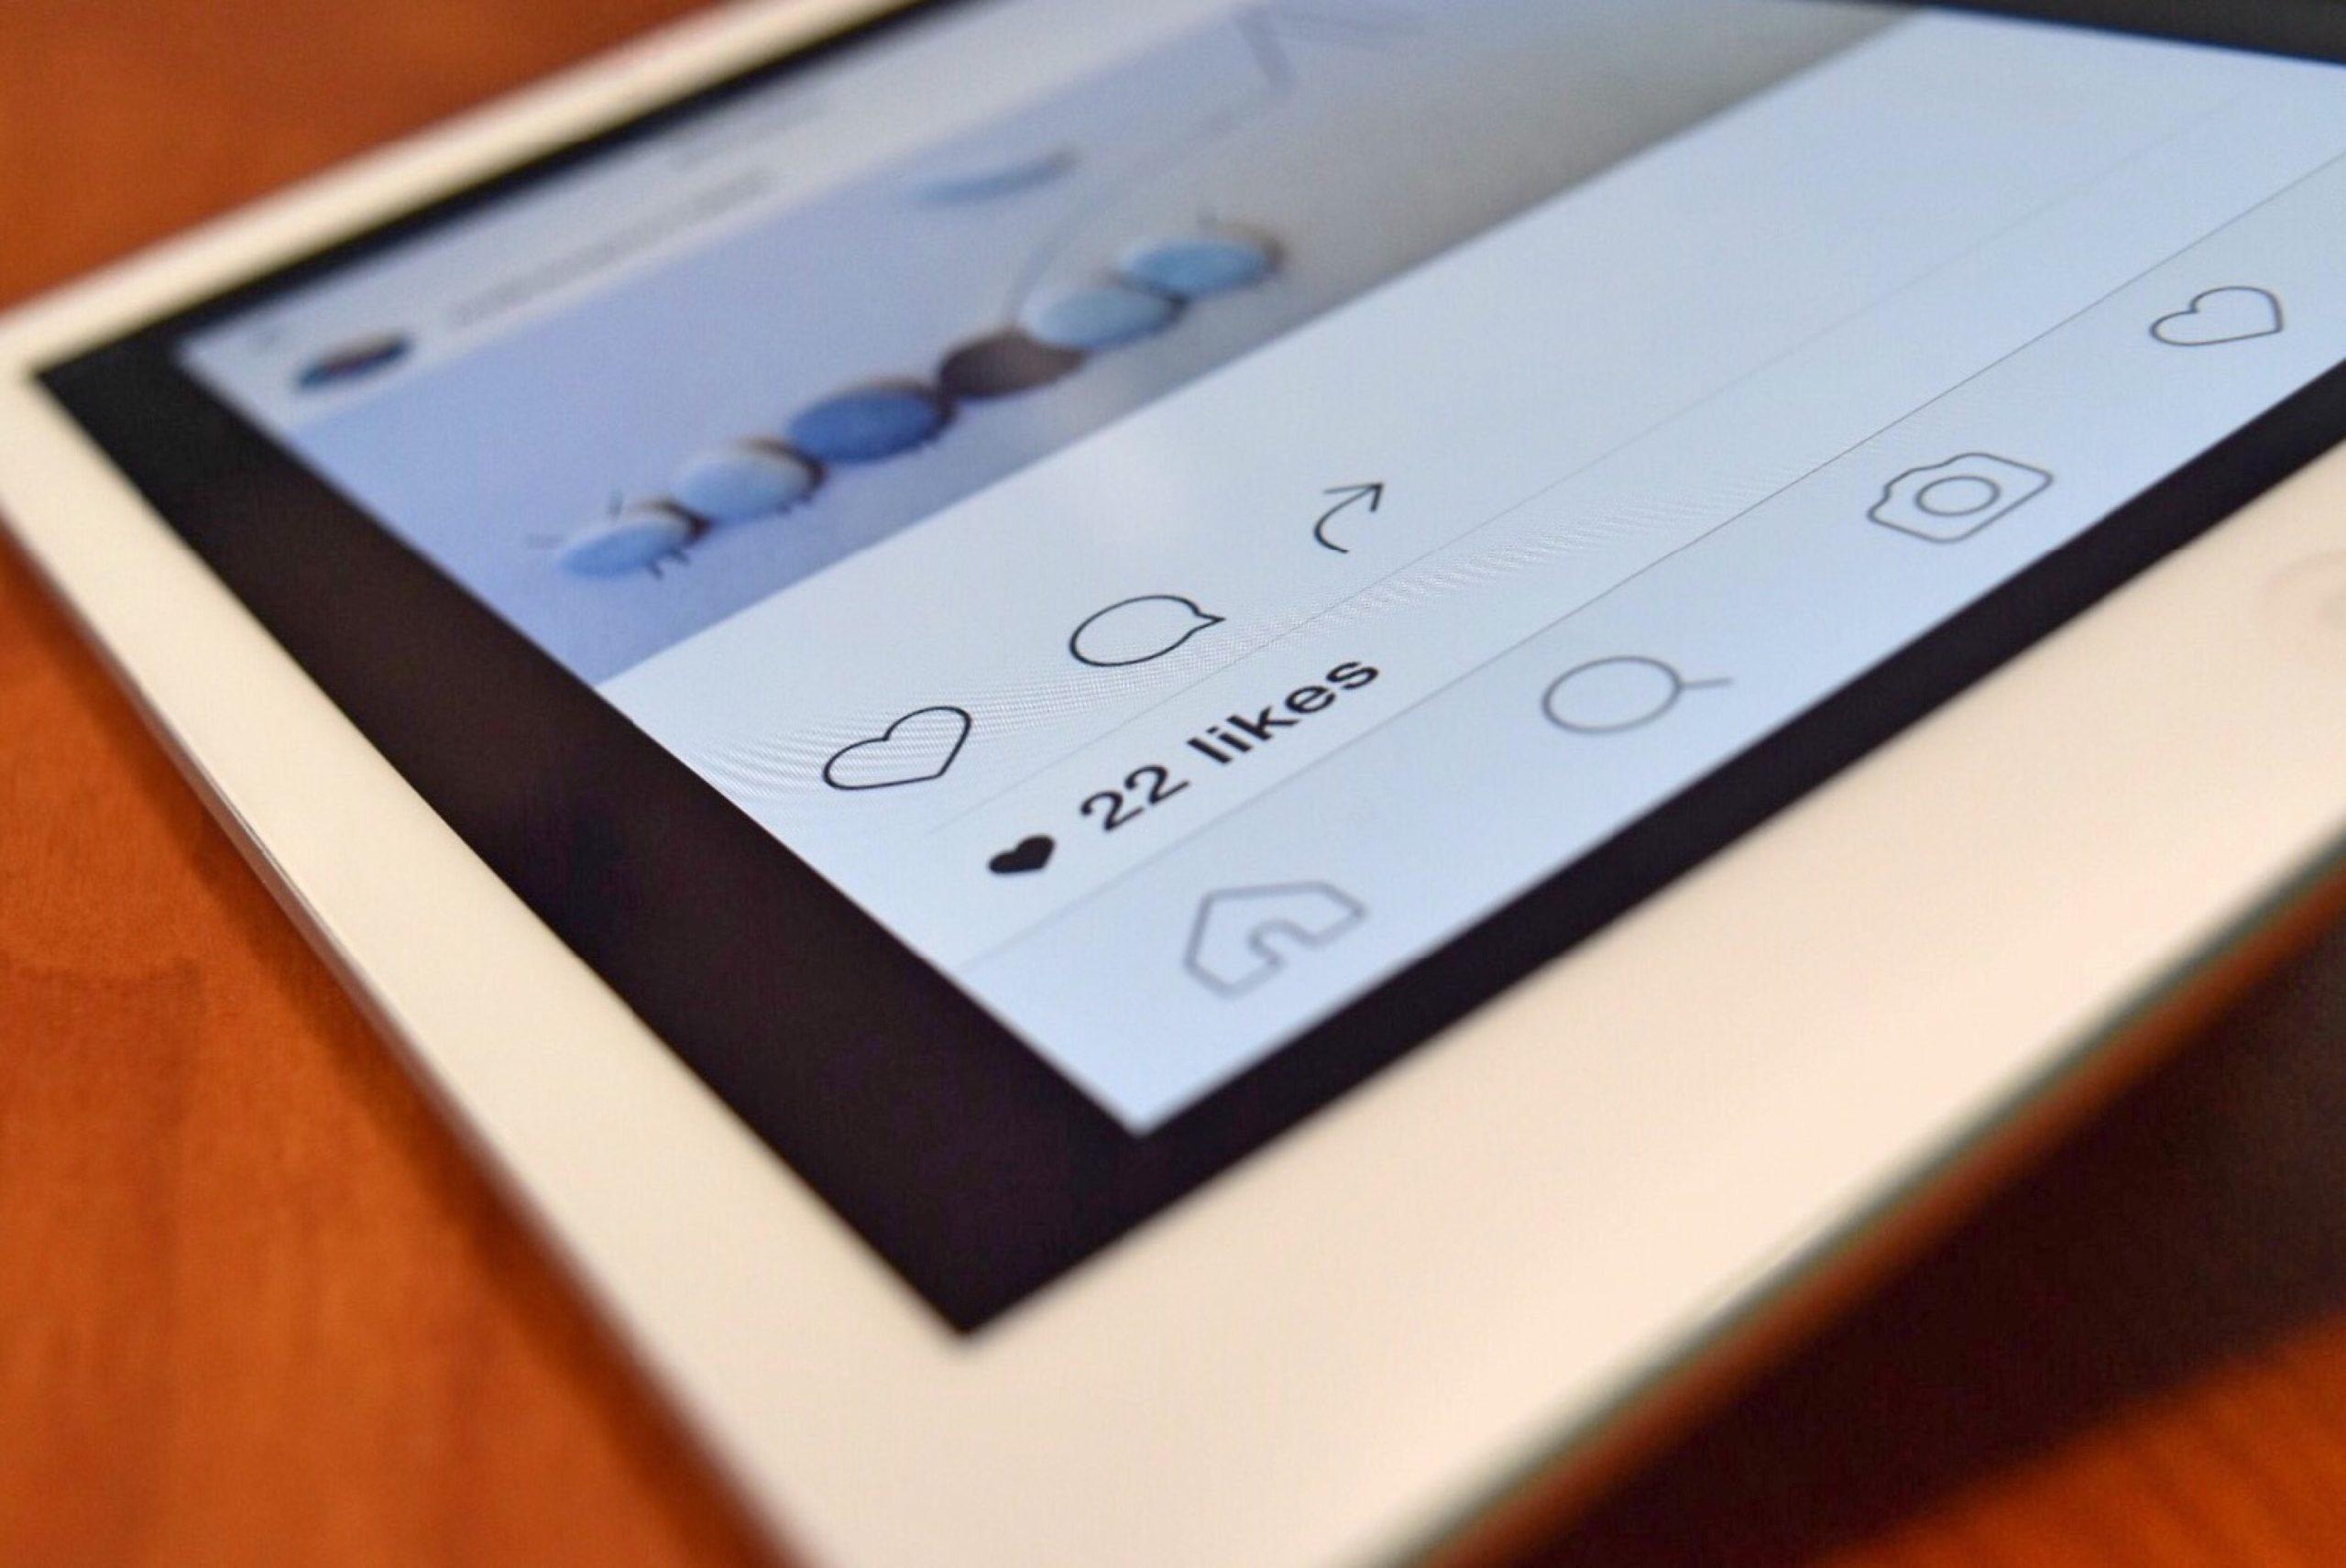 Auto Follow Instagram Gets You Followers